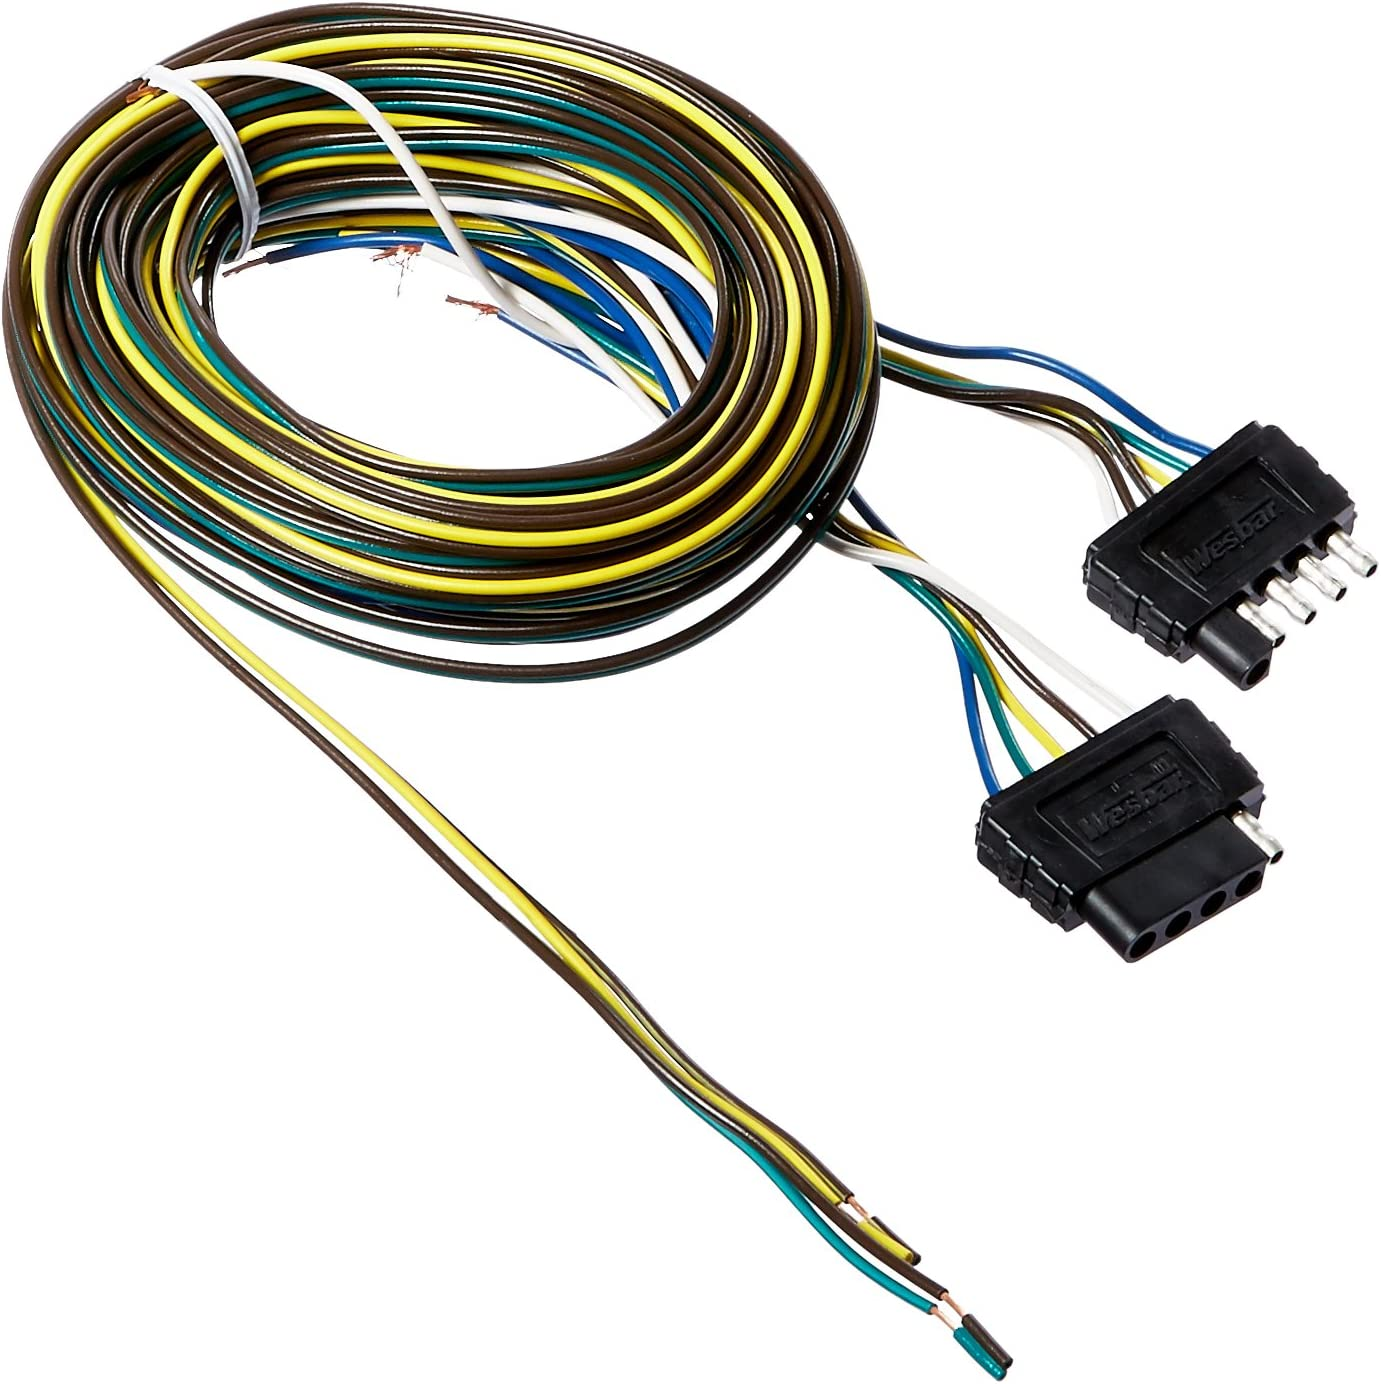 Amazon.com: Wesbar 707105 25' Wishbone Trailer Wiring Harness Kit with  Hardware: AutomotiveAmazon.com